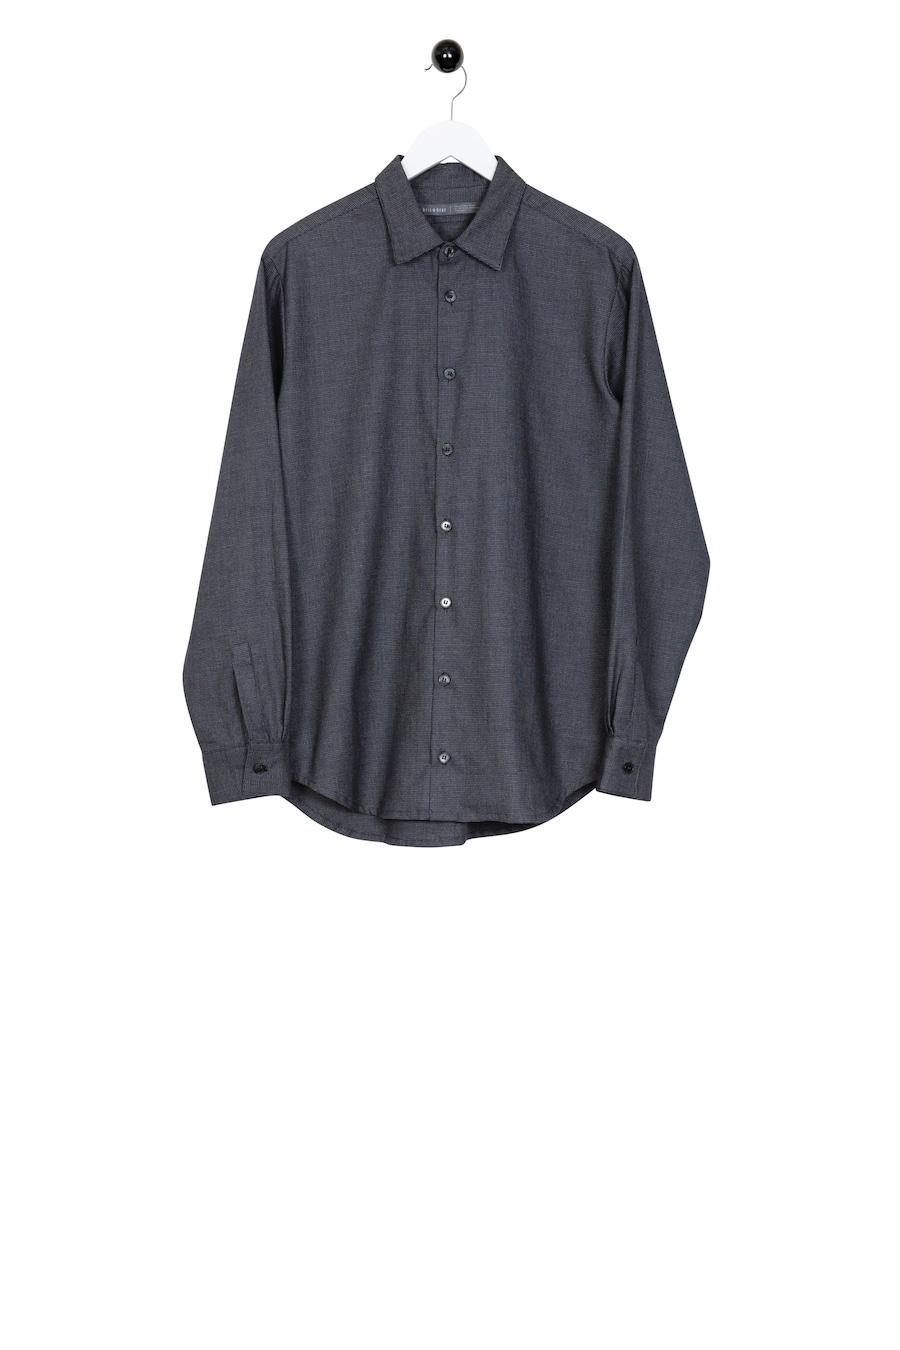 Ornsey Shirt